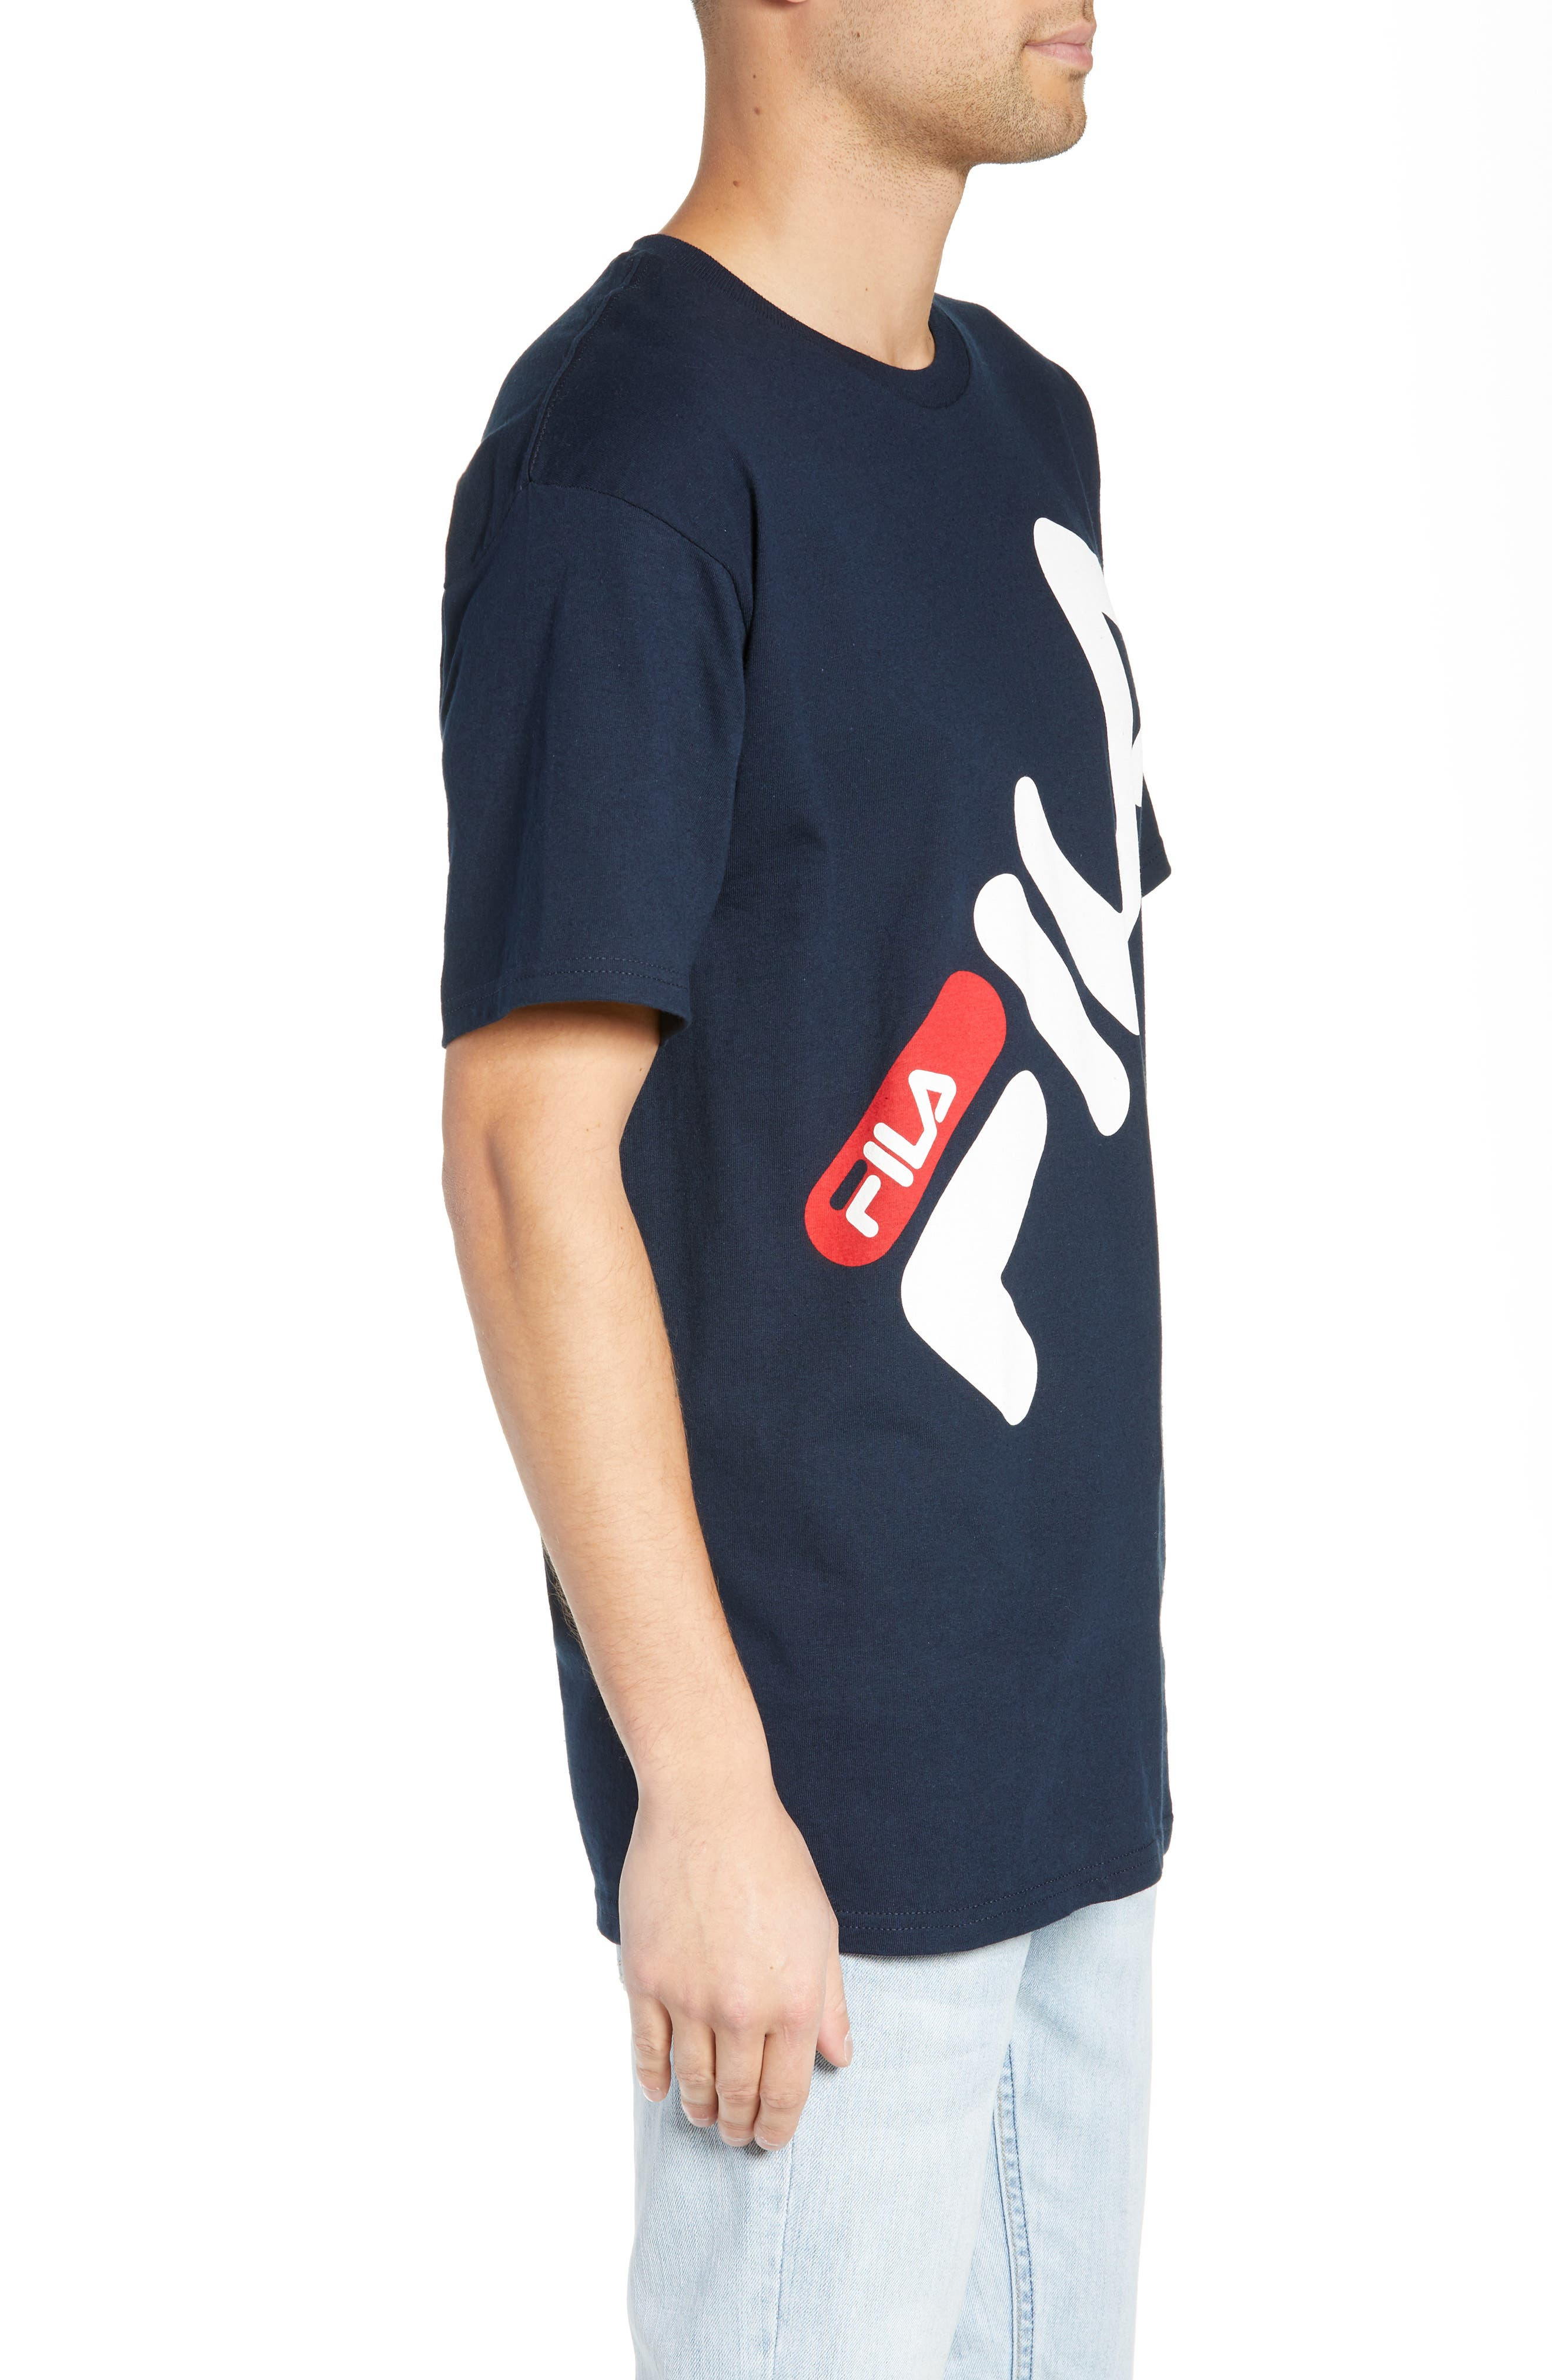 Micah Logo T-Shirt,                             Alternate thumbnail 3, color,                             NAVY/ WHITE/ CHINESE RED